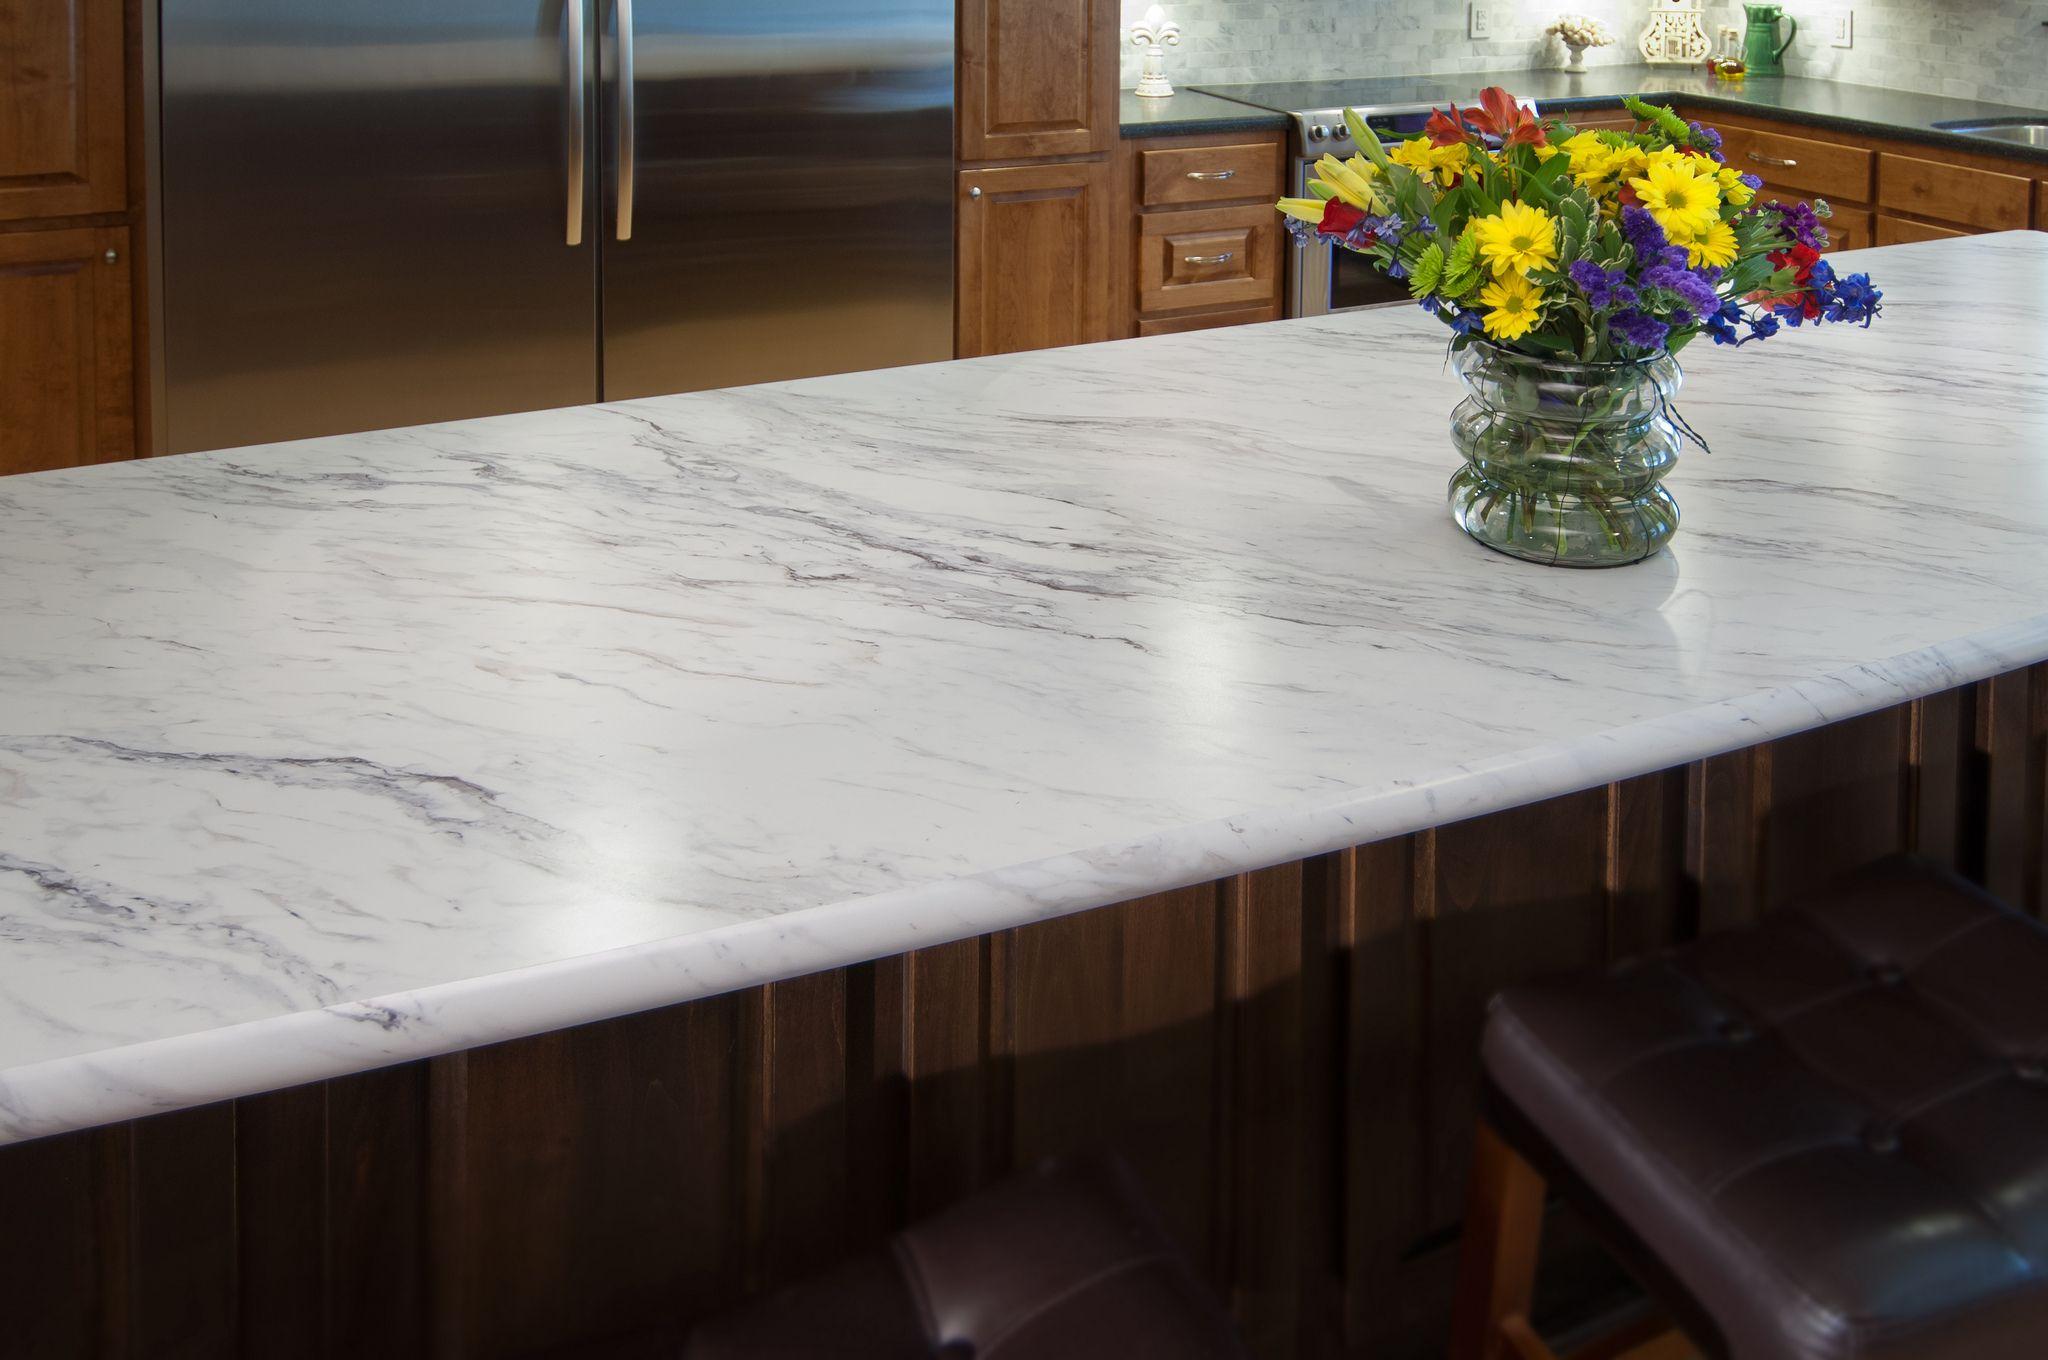 Laminate Kitchen Countertops Kohler Undermount Sink Wilsonart Premium Calcutta Marble 4925